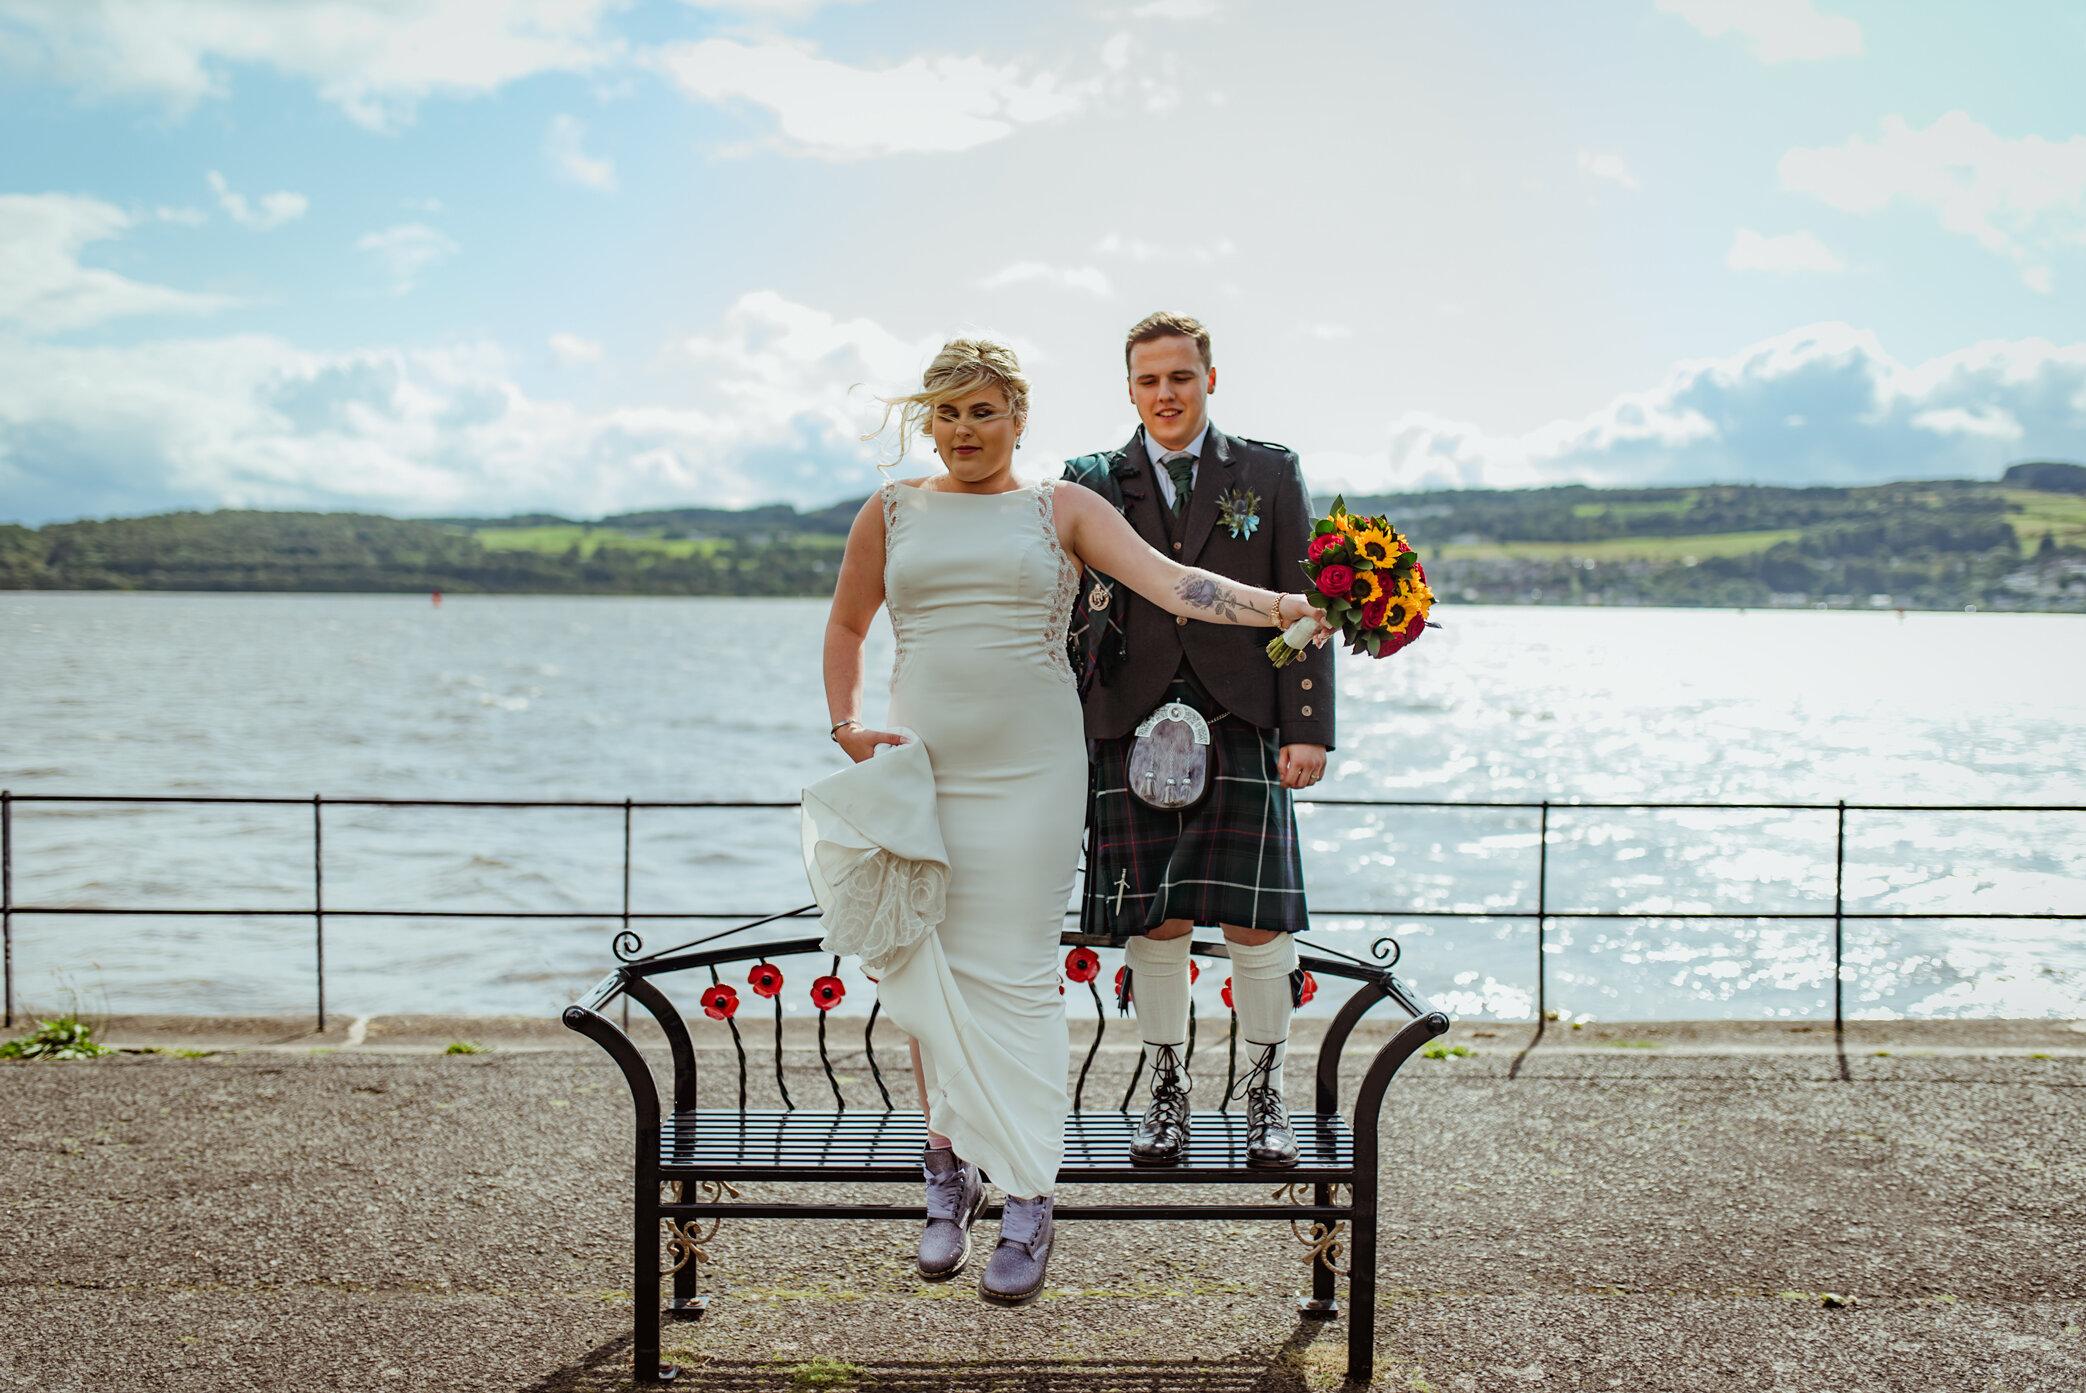 alternative-wedding-photography-glasgow-dumbarton (5).jpg